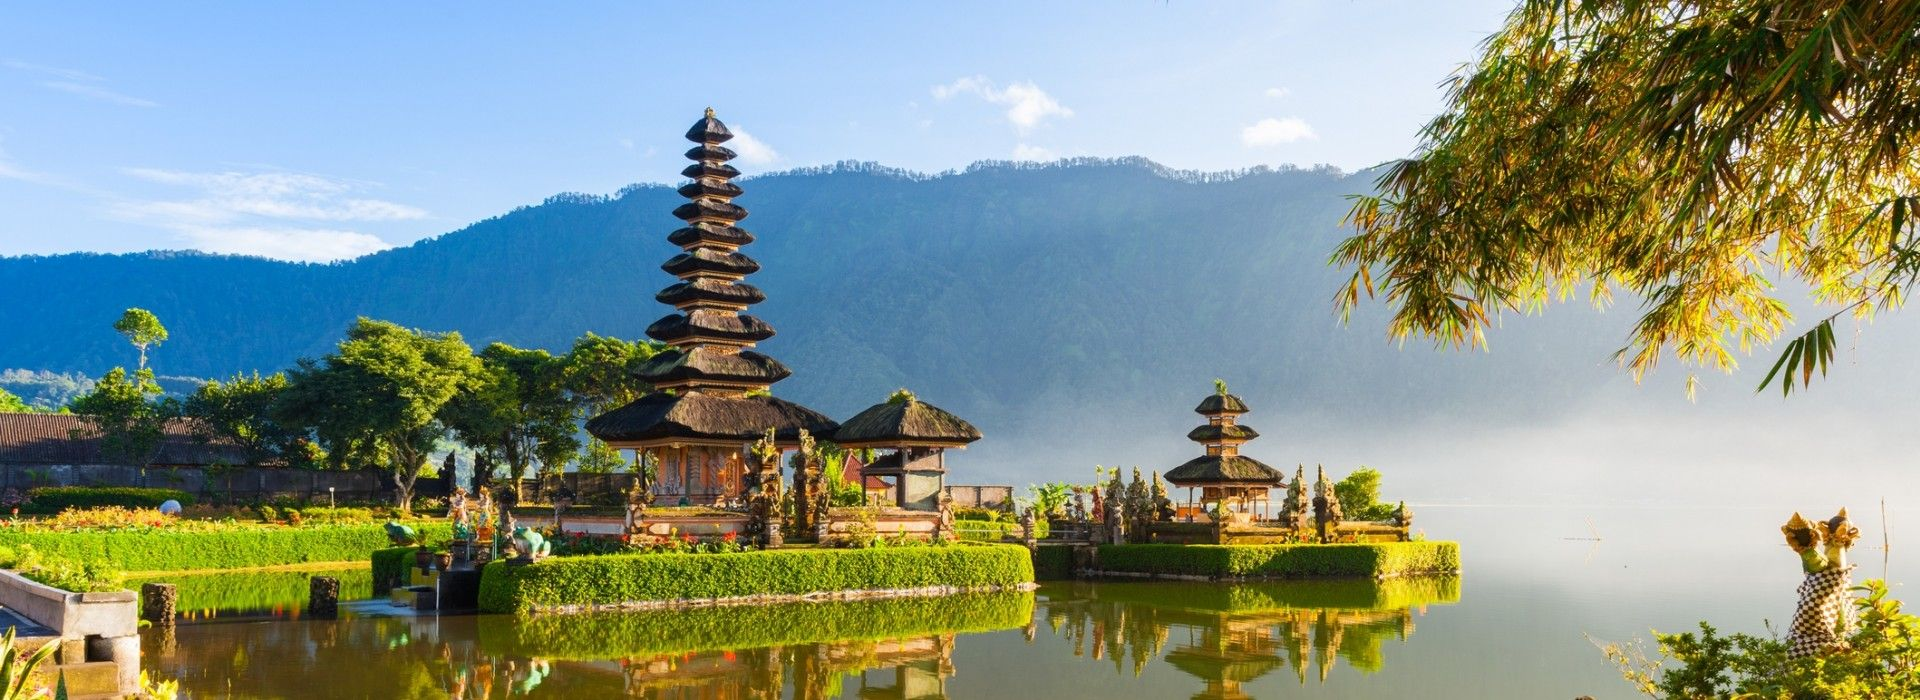 Getaways and short breaks Tours in Indonesia